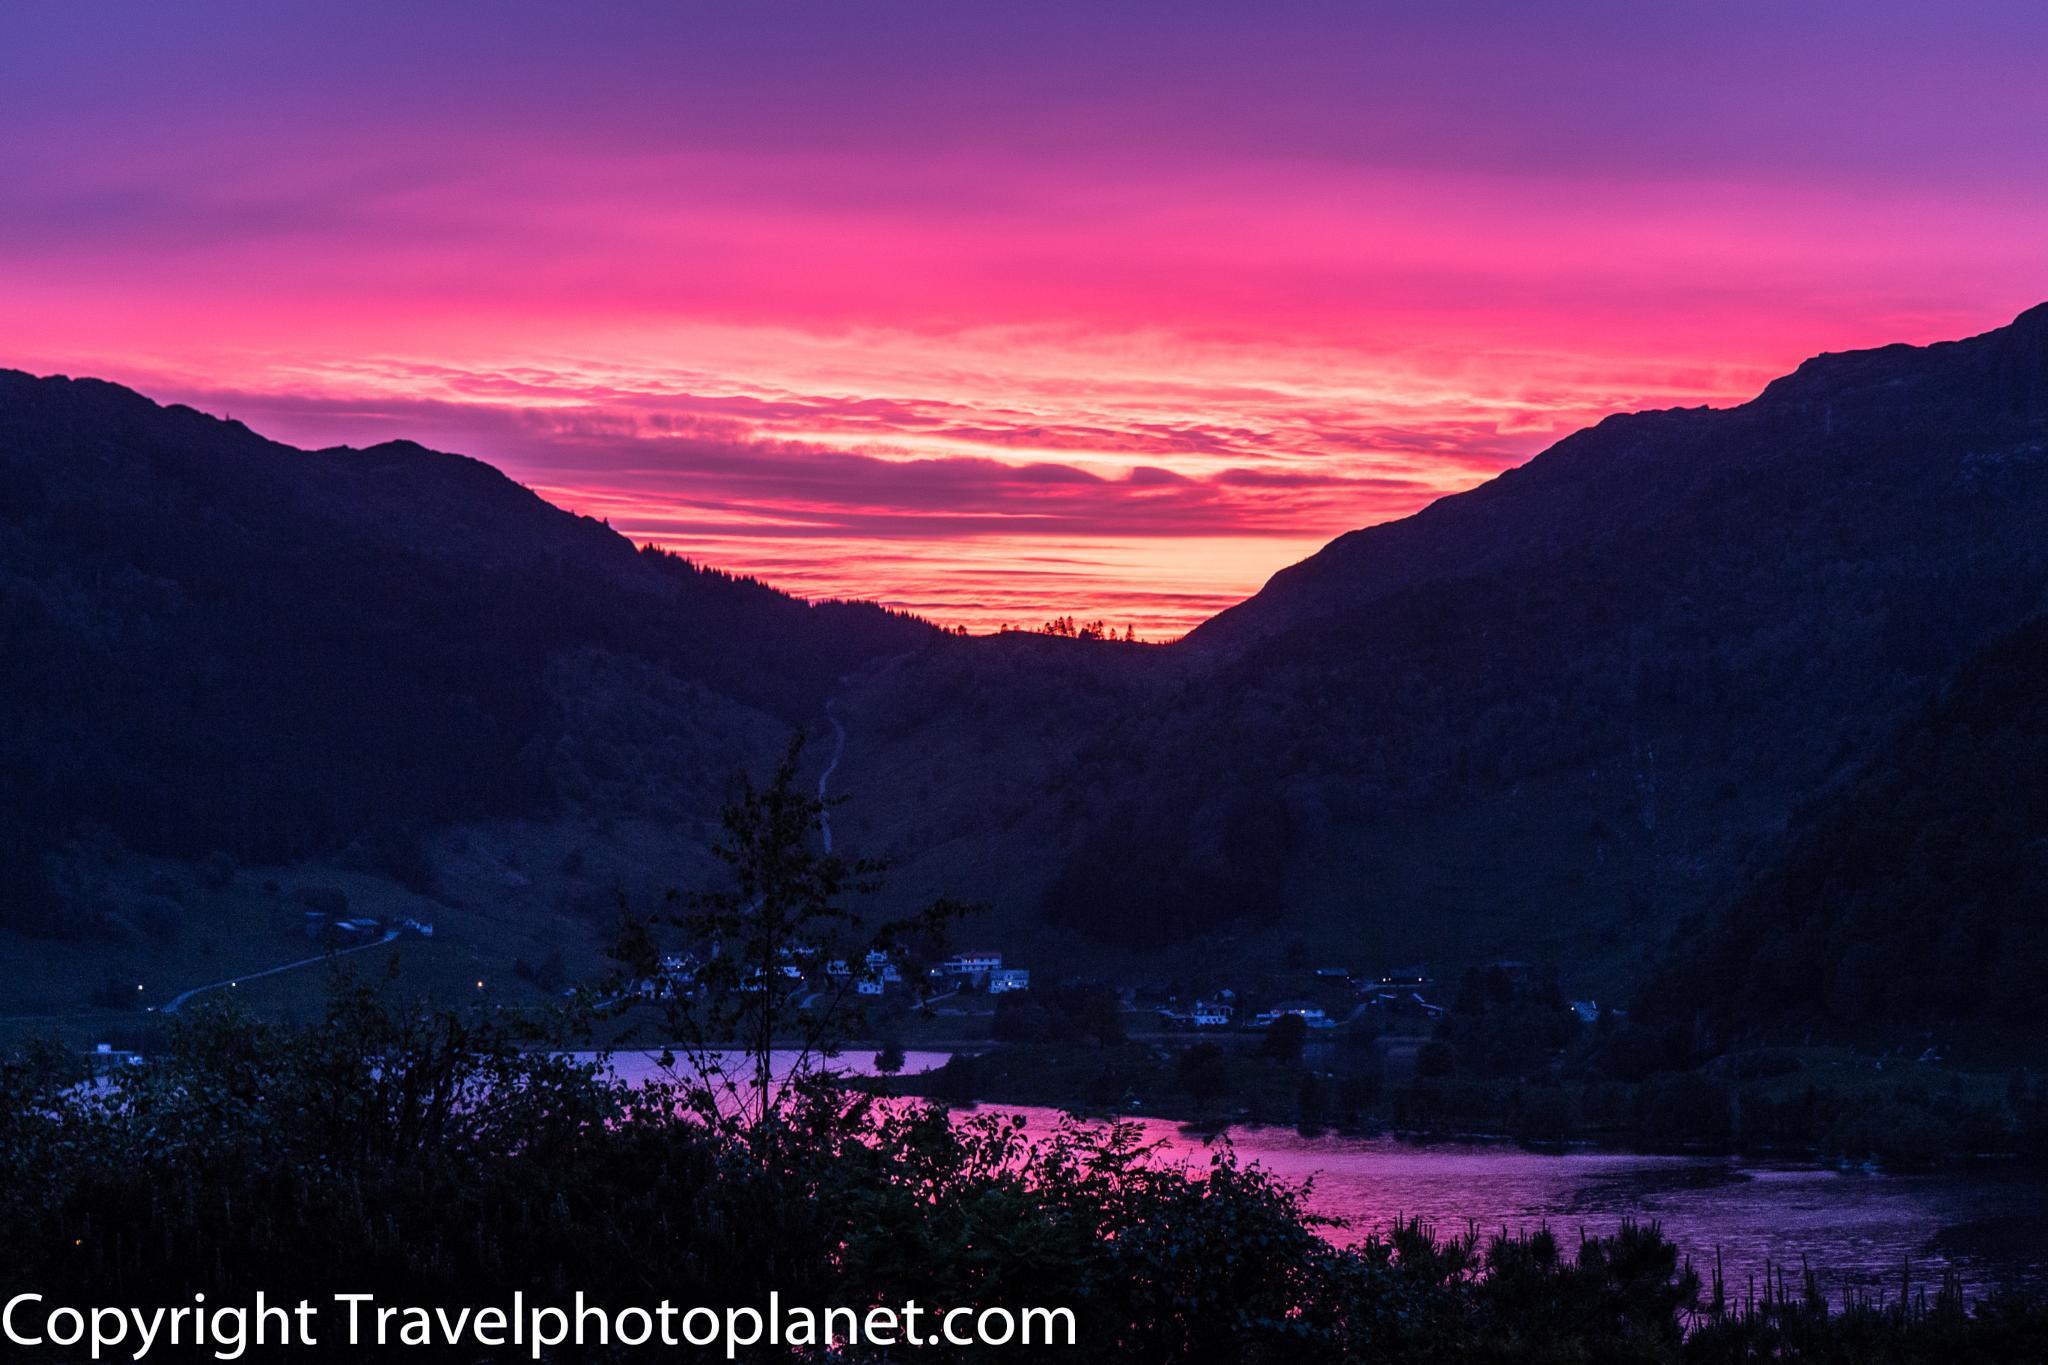 Purple Sunset by Svein Arne Grønnevik